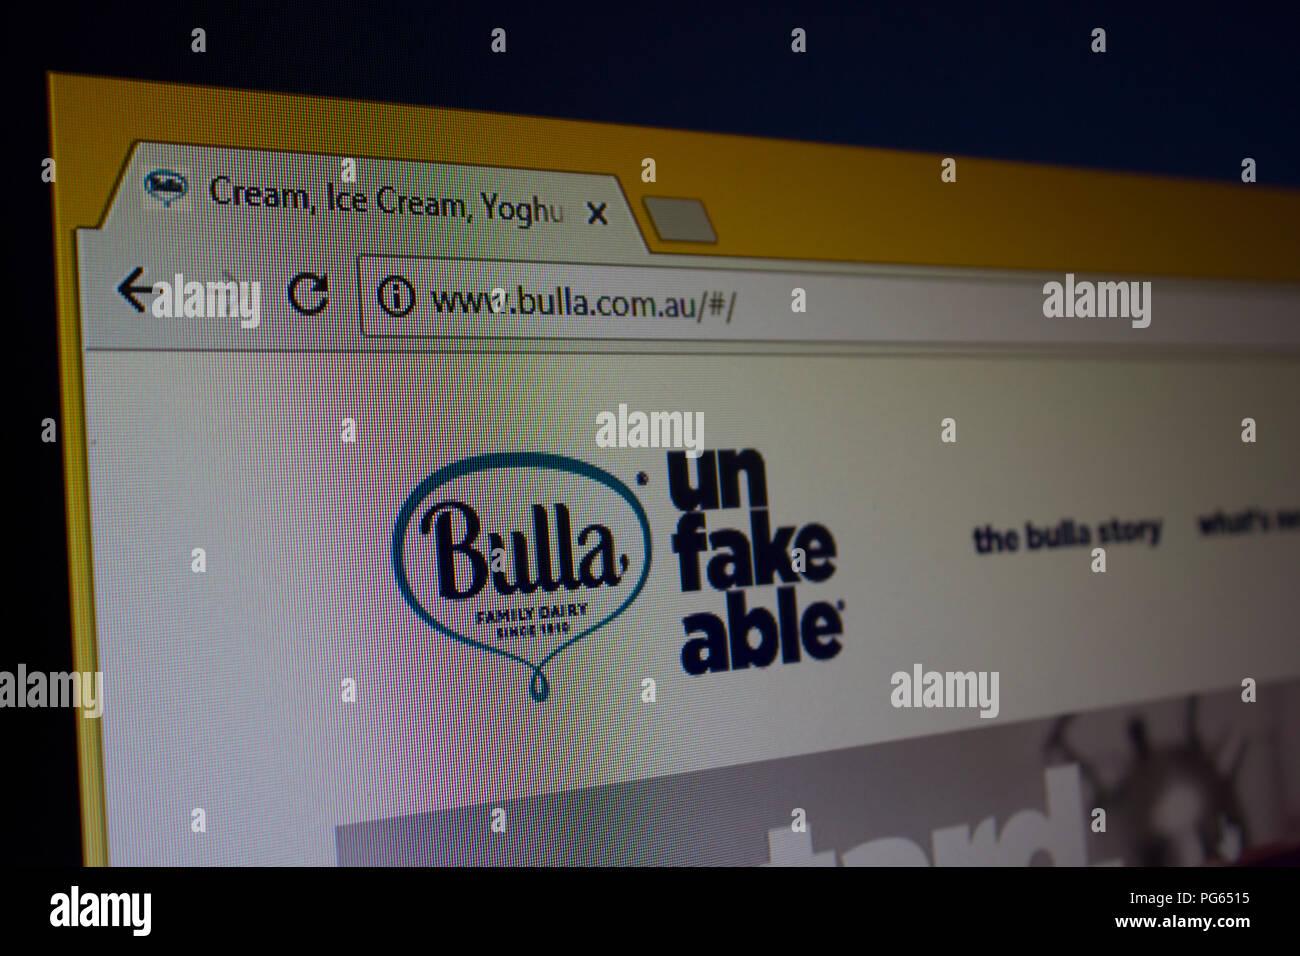 Bulla Website homepage - Stock Image